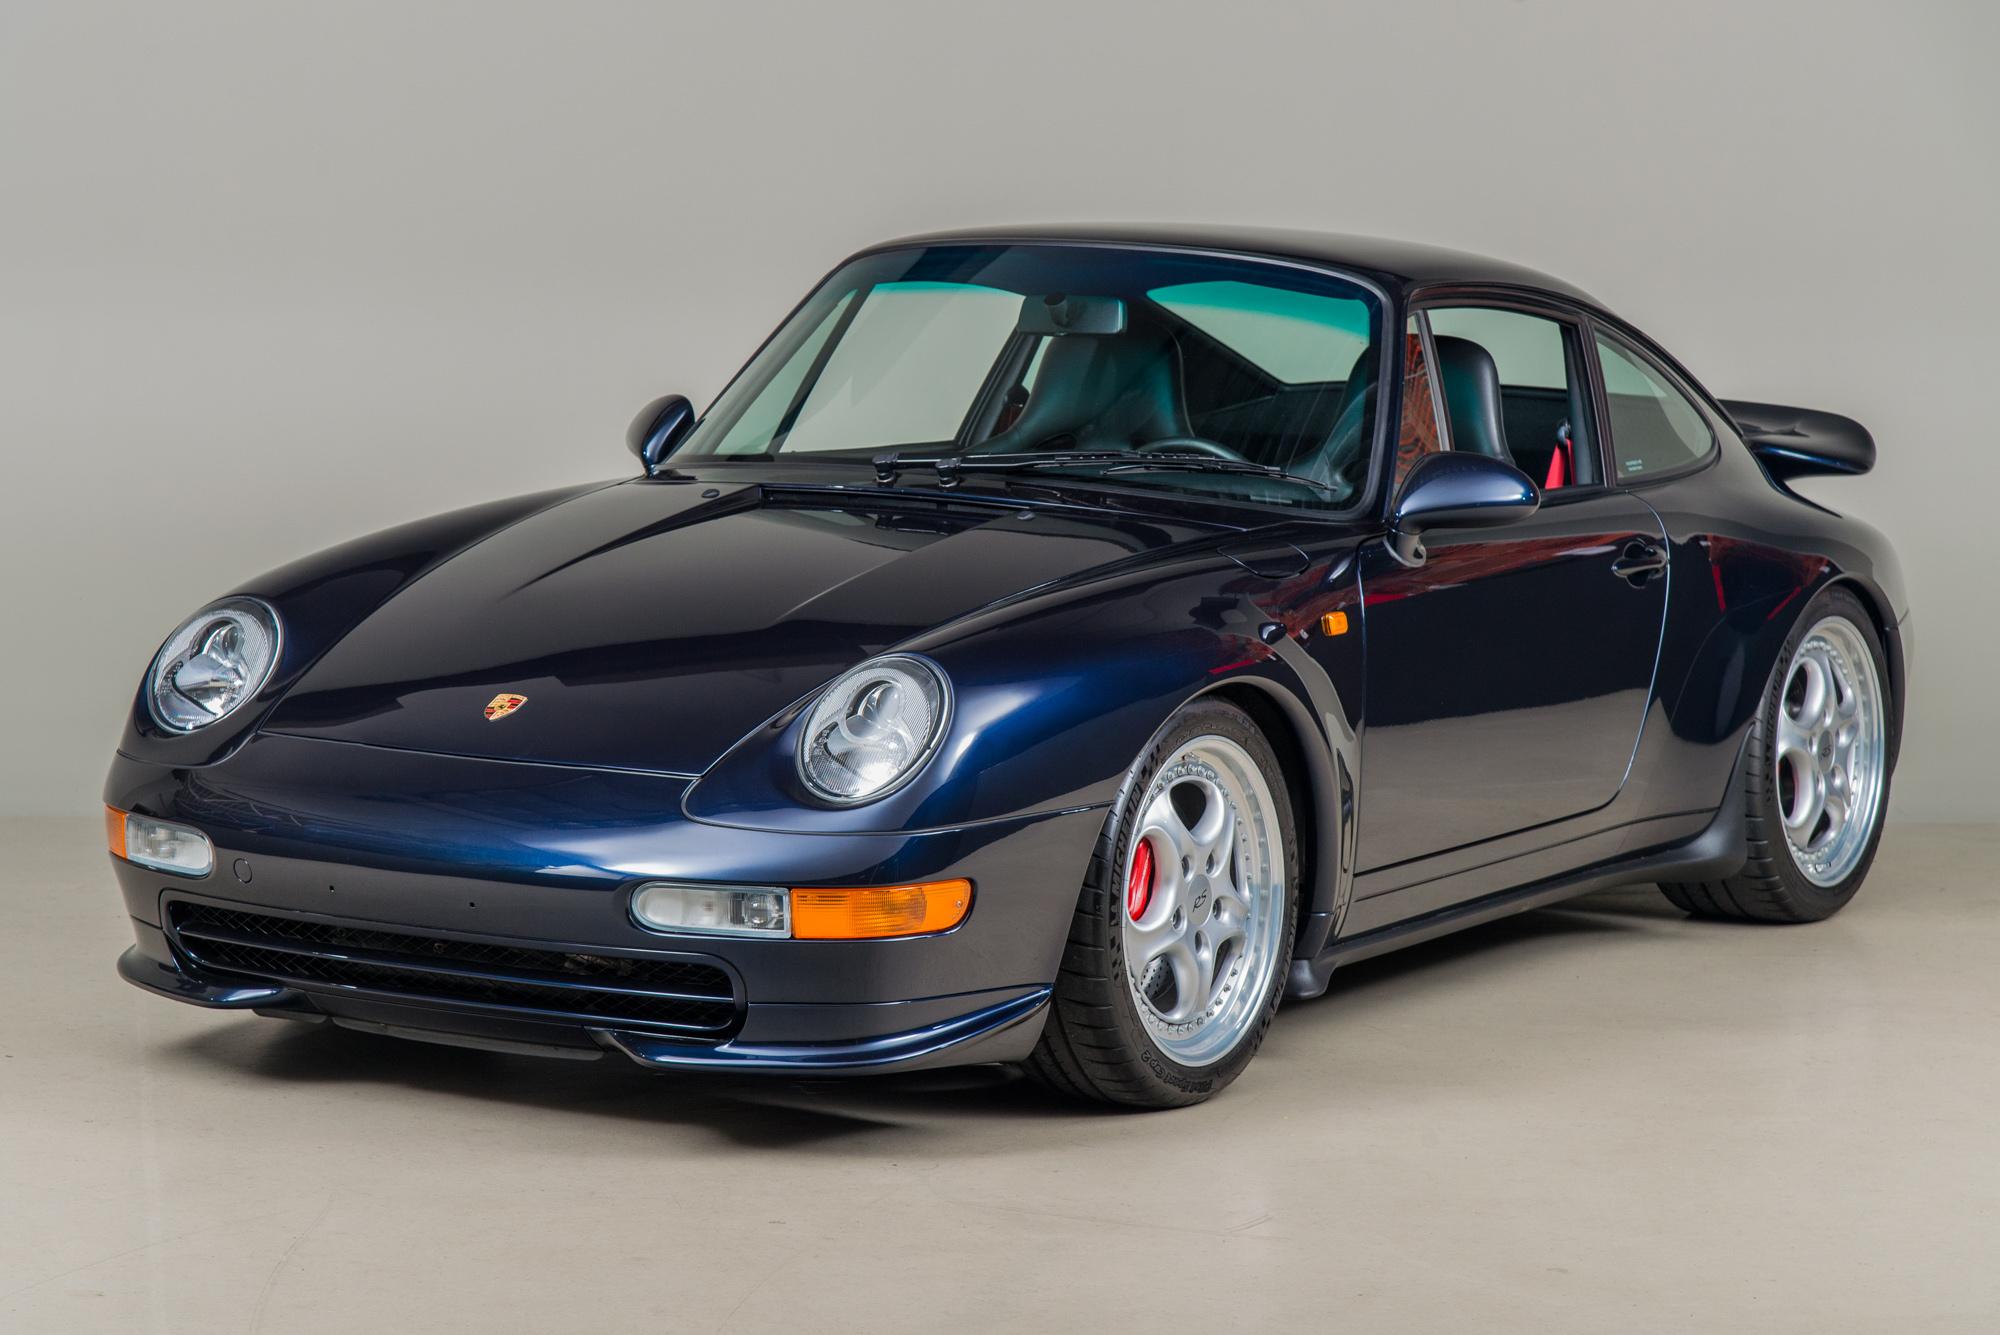 1996 Porsche 911 Carrera RS, MIDNIGHT BLUE, VIN WP0ZZZ99ZTS390067, MILEAGE 32444